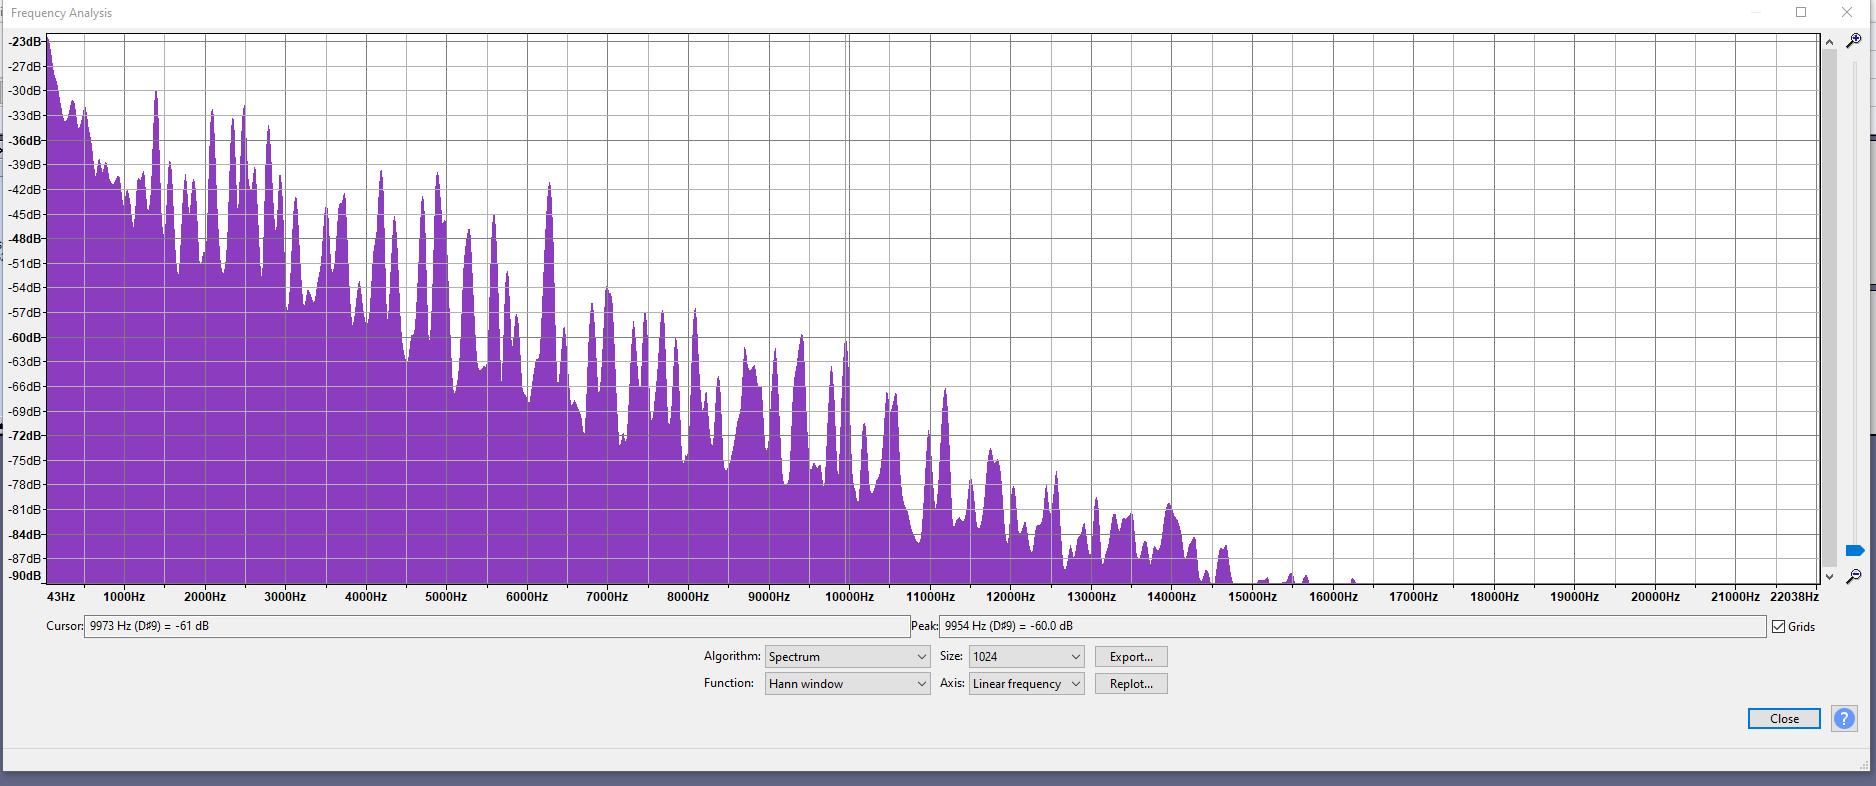 e30_bagpipe_freq_analysis.PNG